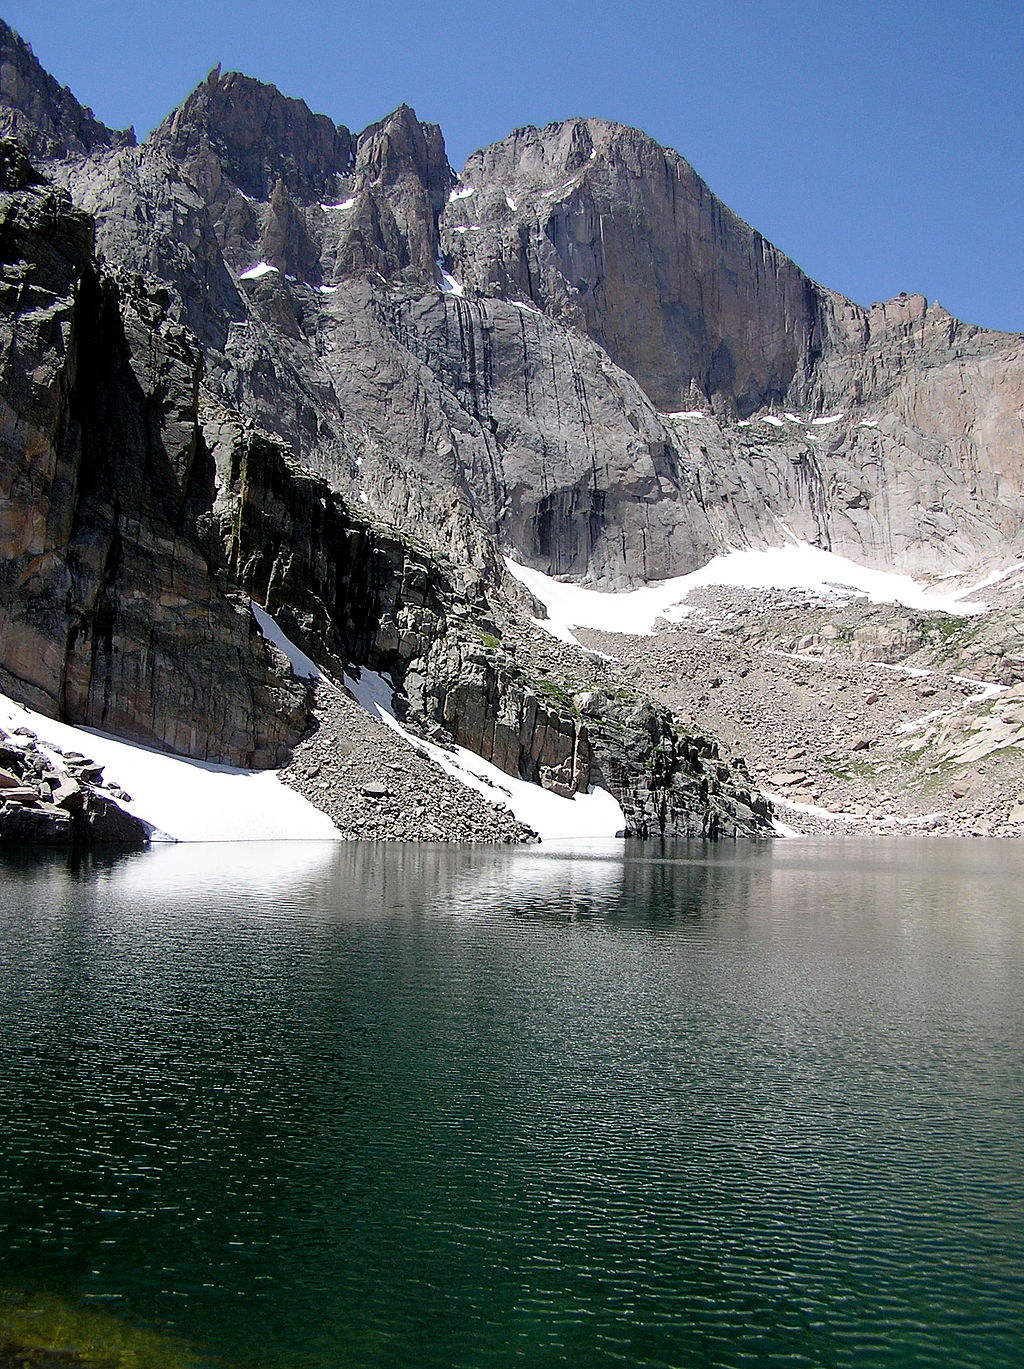 High Alpine Lake Rocky Mountain National Park Colorado USA